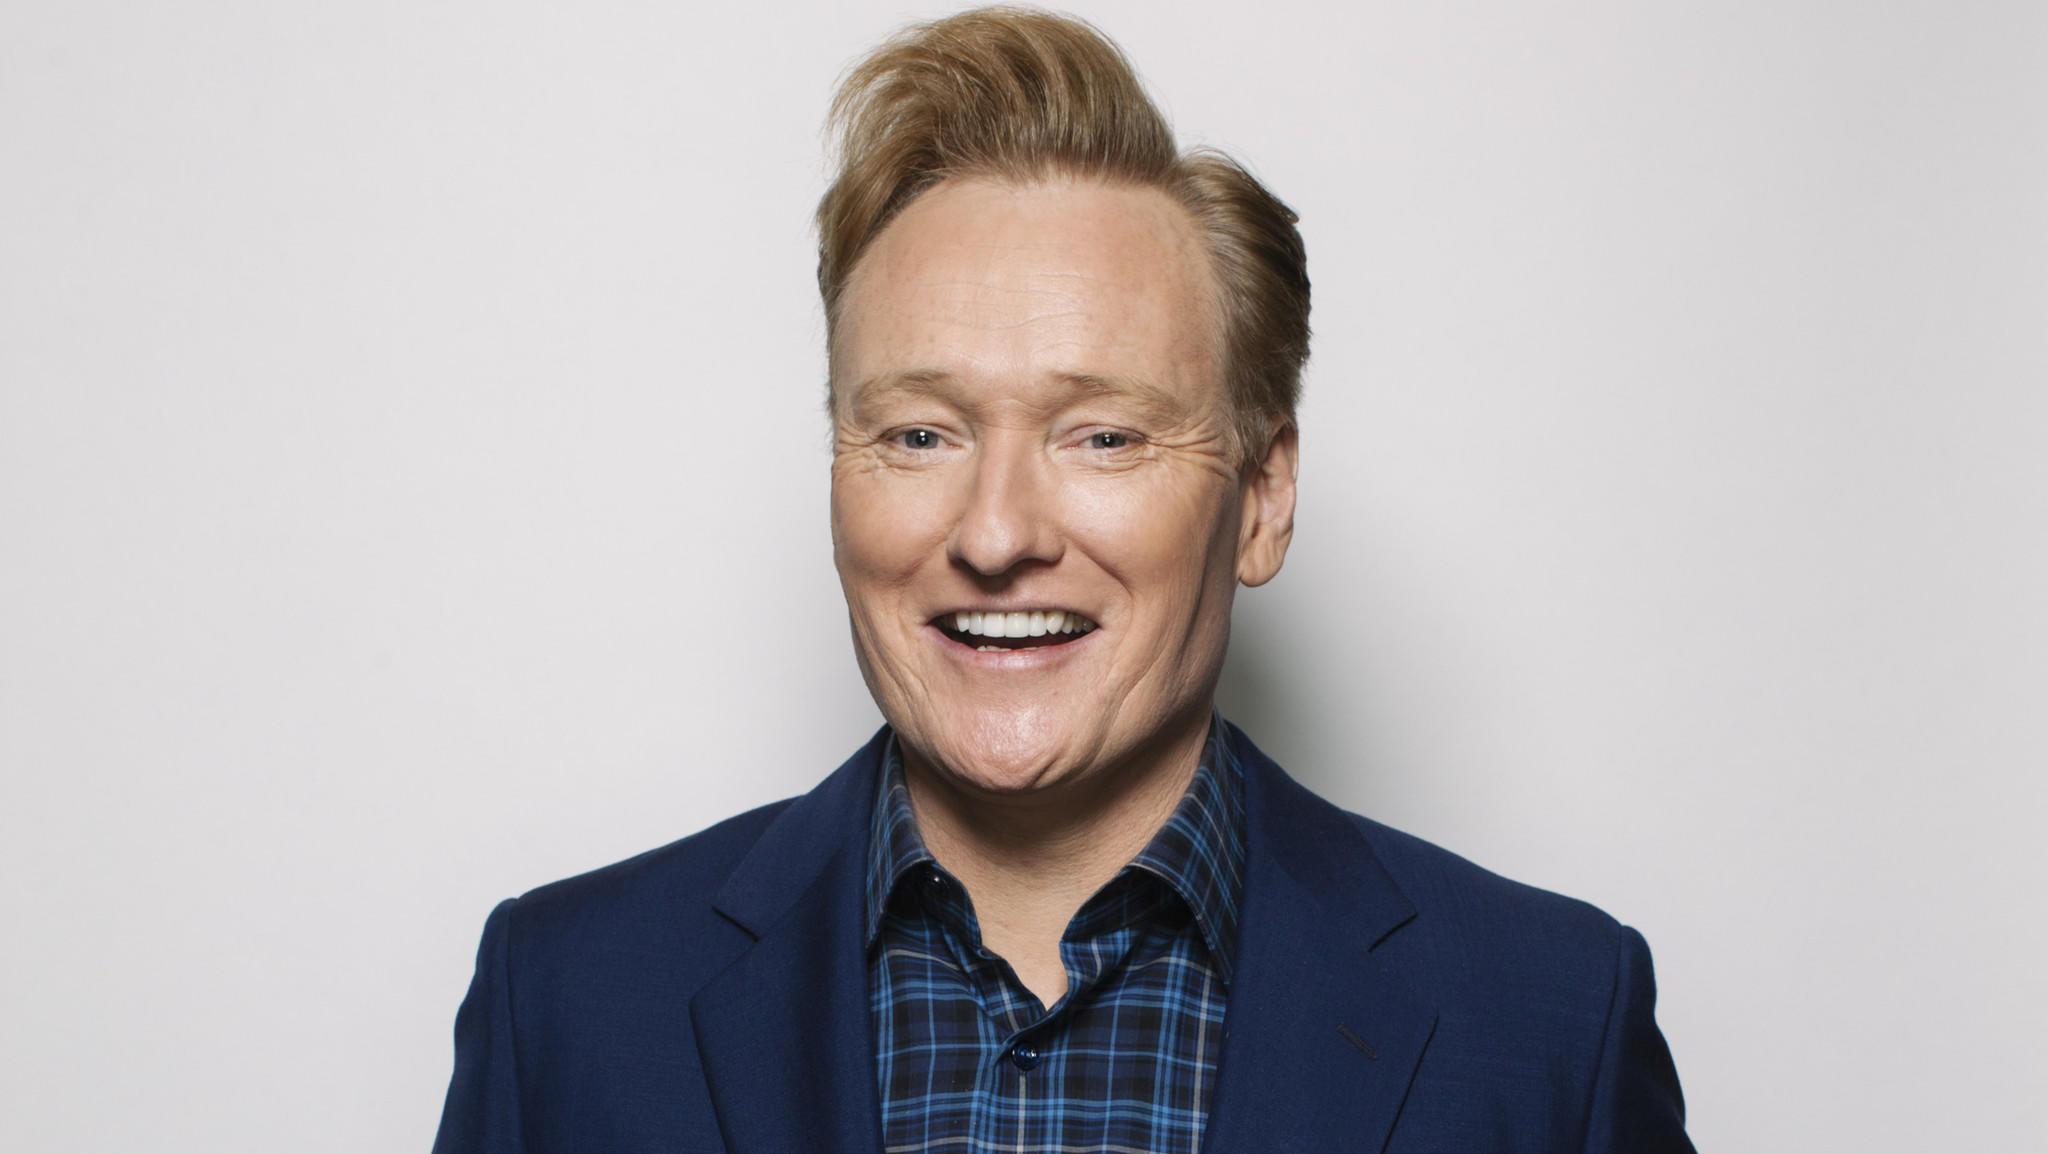 Conan O'Brien. (Jay L. Clendenin / Los Angeles Times)